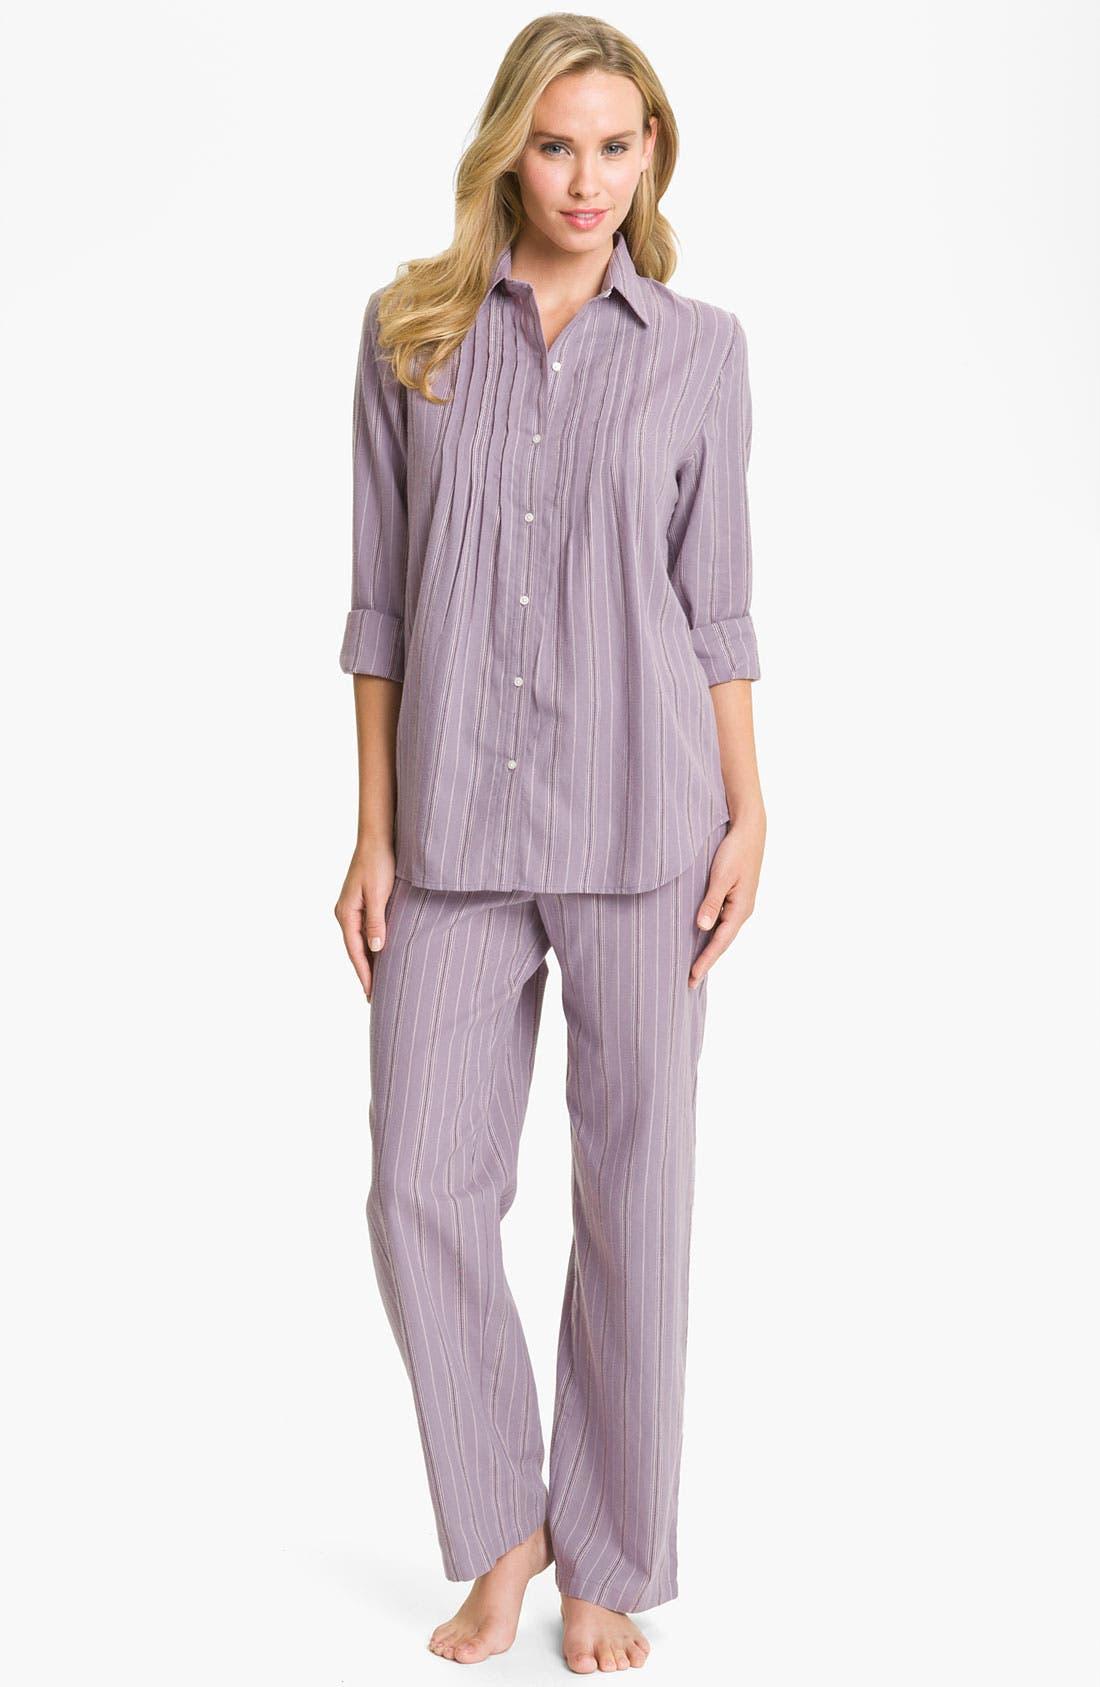 Main Image - Lauren Ralph Lauren Sleepwear Brushed Twill Pajamas